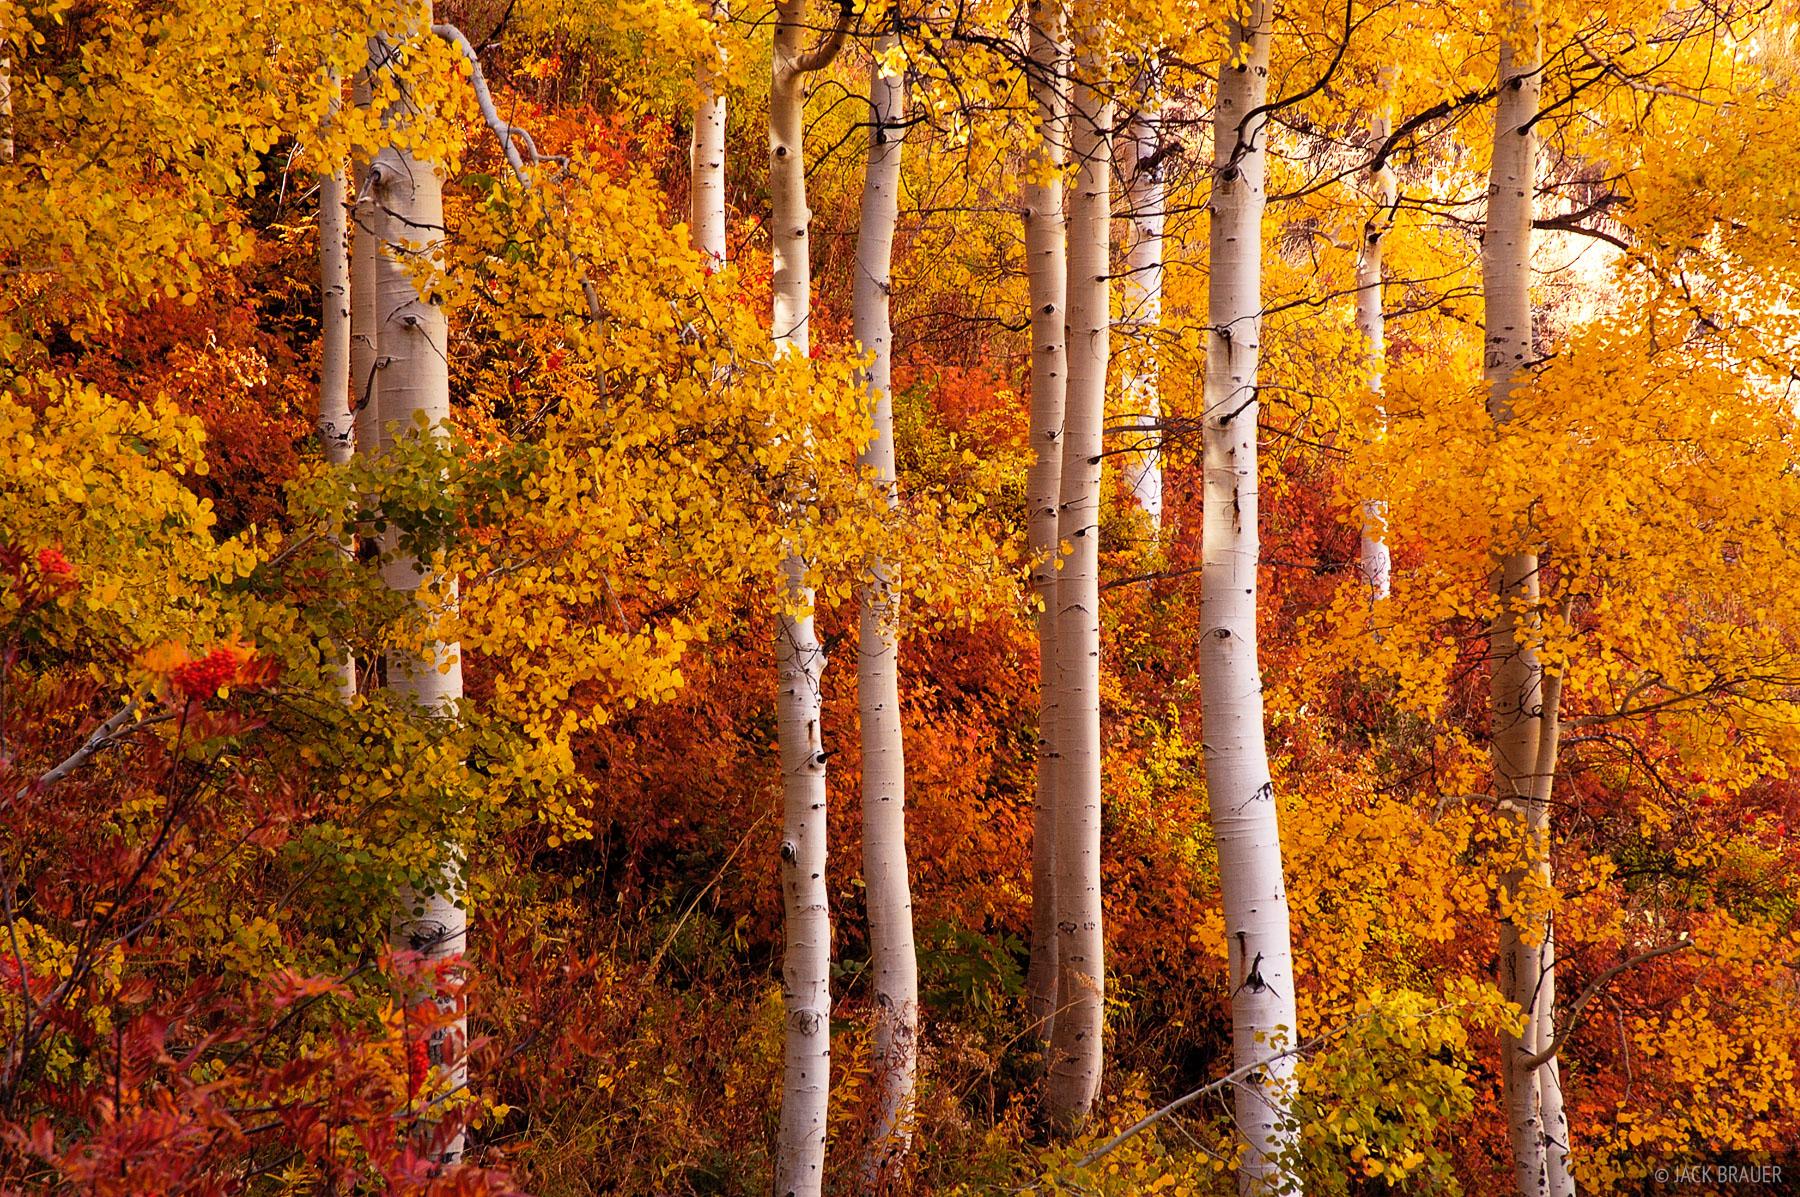 Aspens, Butler Creek, Little Cottonwood Canyon, Wasatch Range, Utah, photo